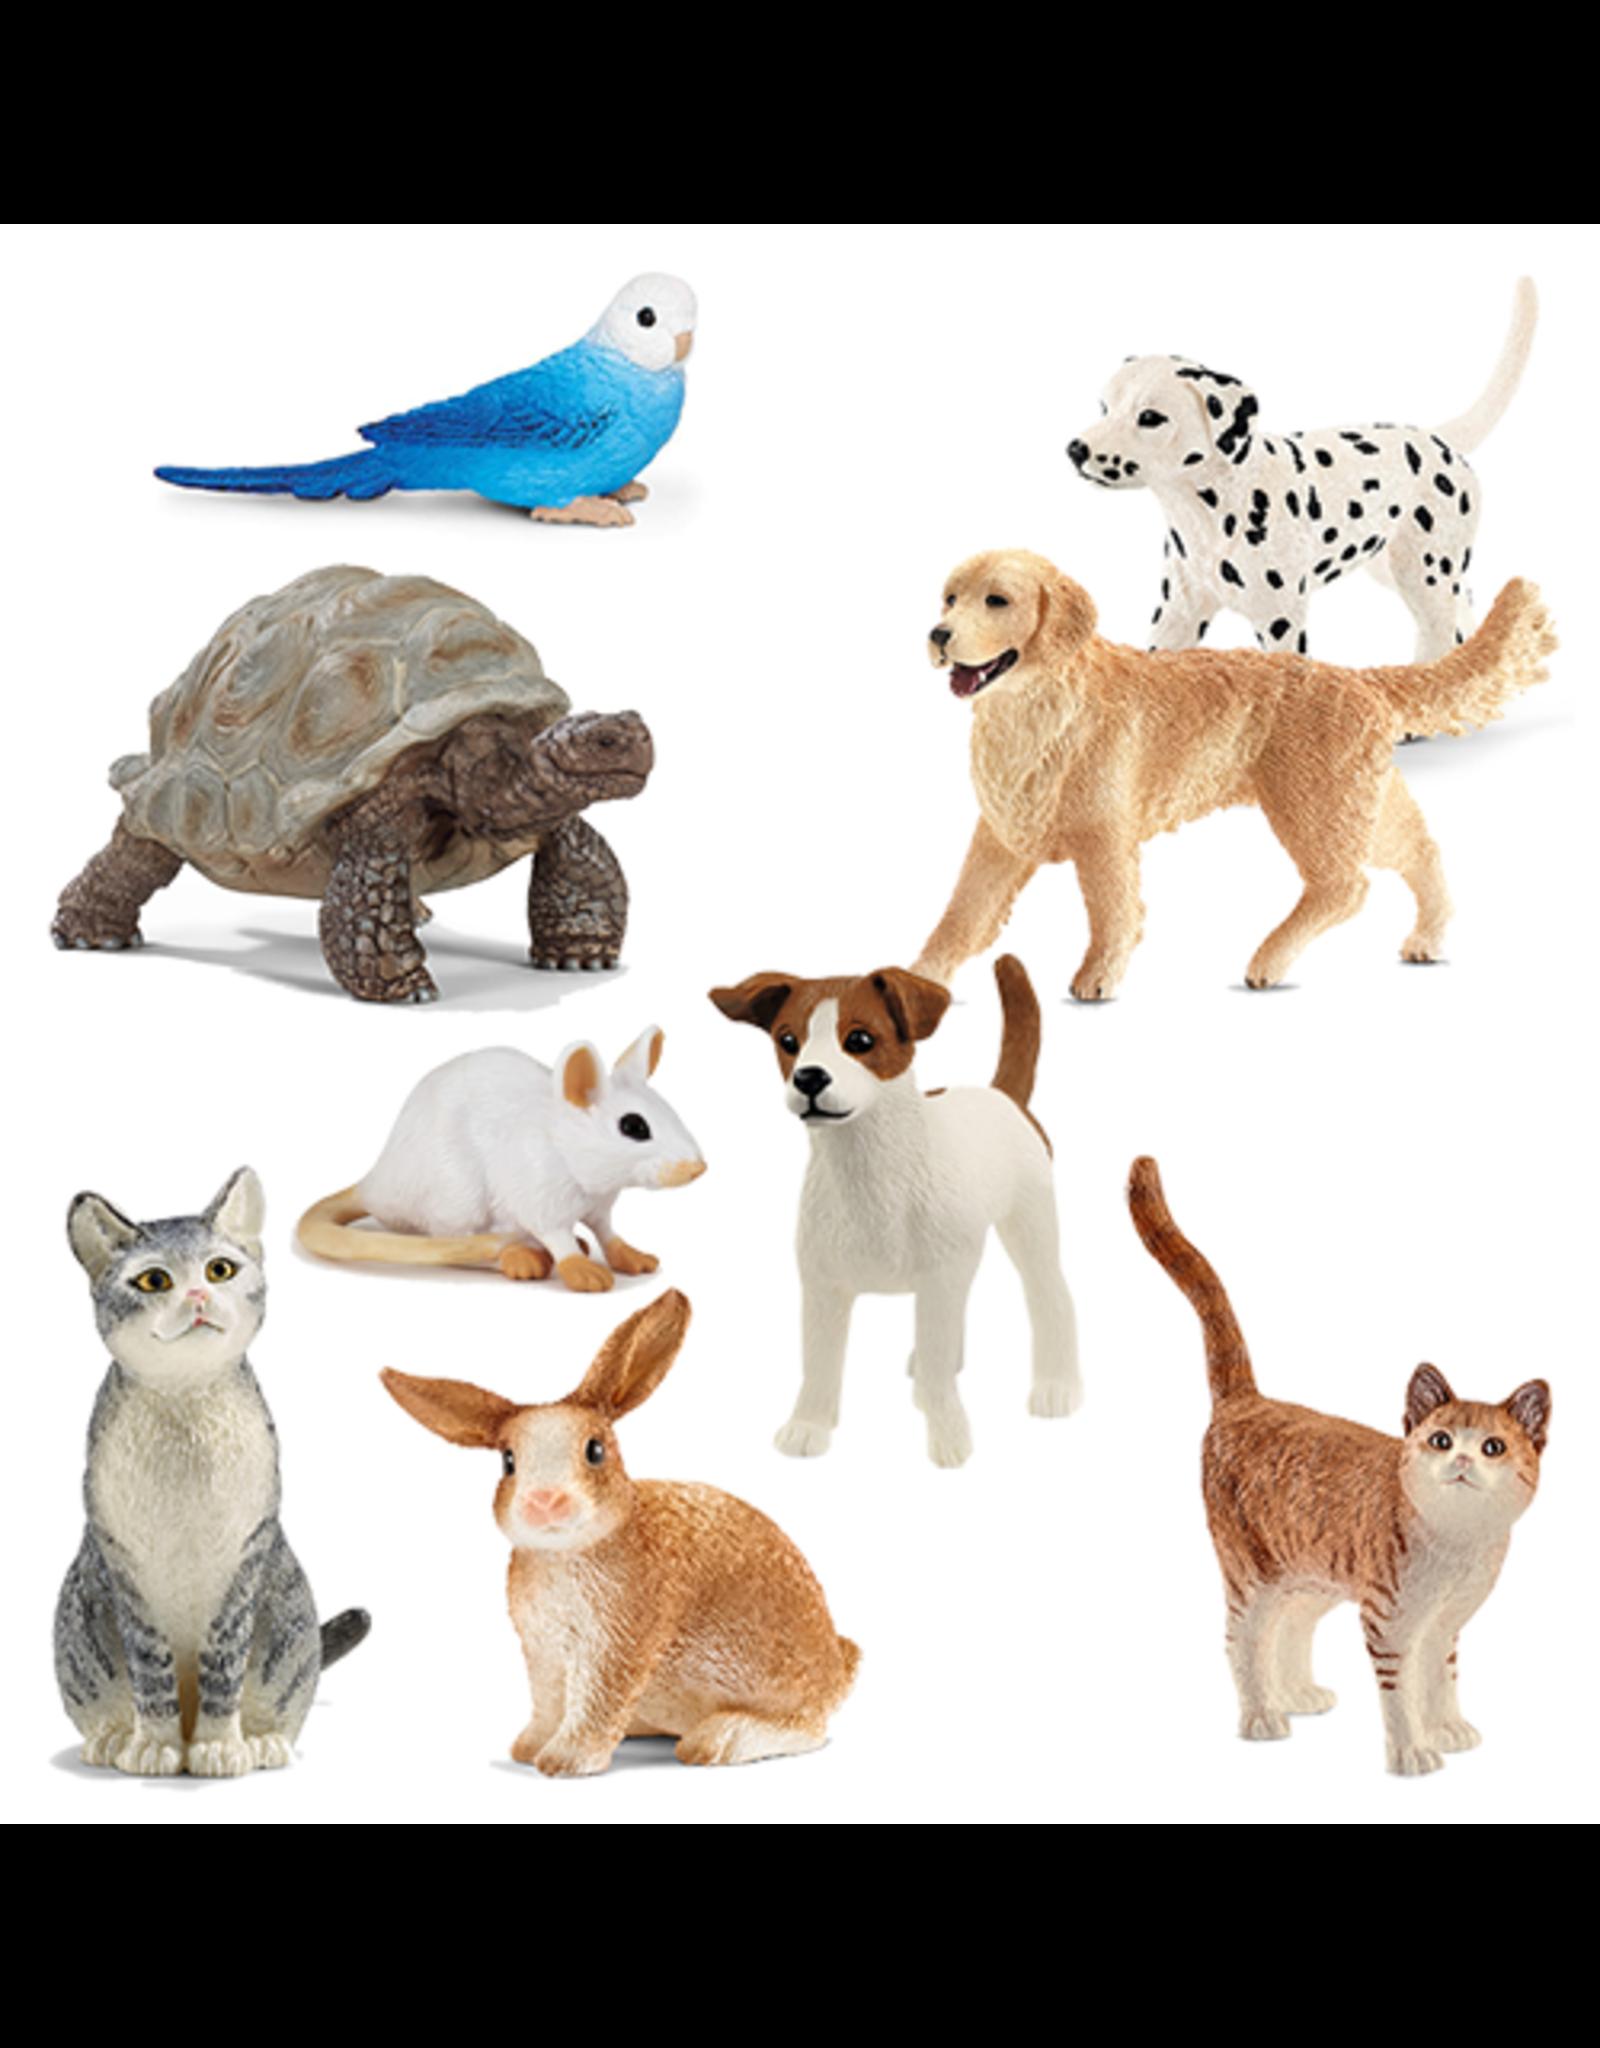 Miniature Pets Assortment 9pc